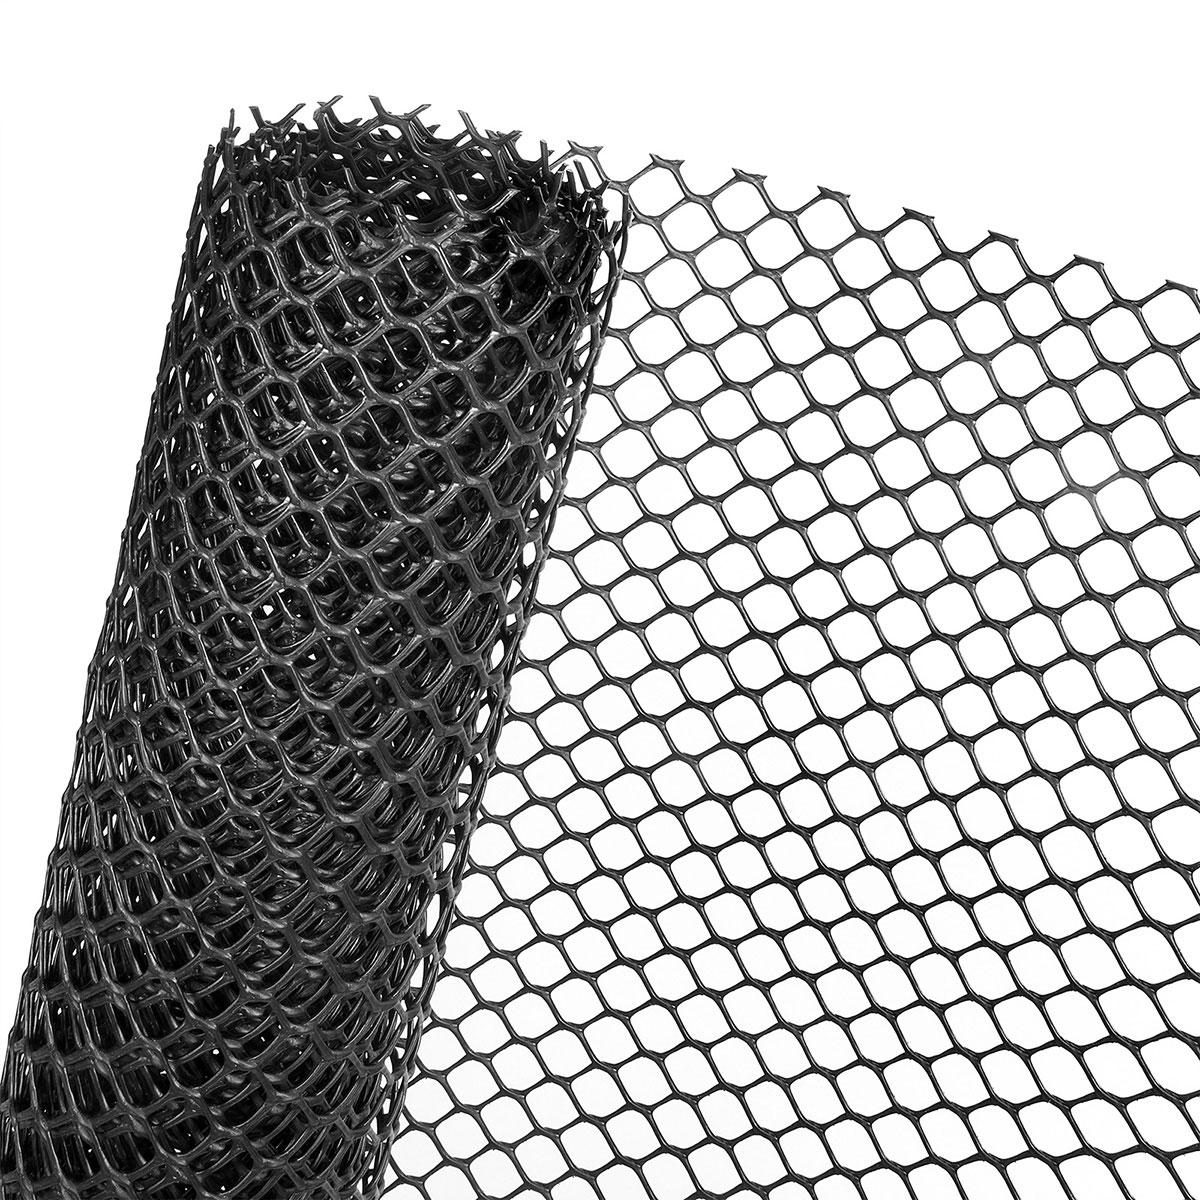 rasenschutzgitter 1 3m br meterware masche 30mm. Black Bedroom Furniture Sets. Home Design Ideas